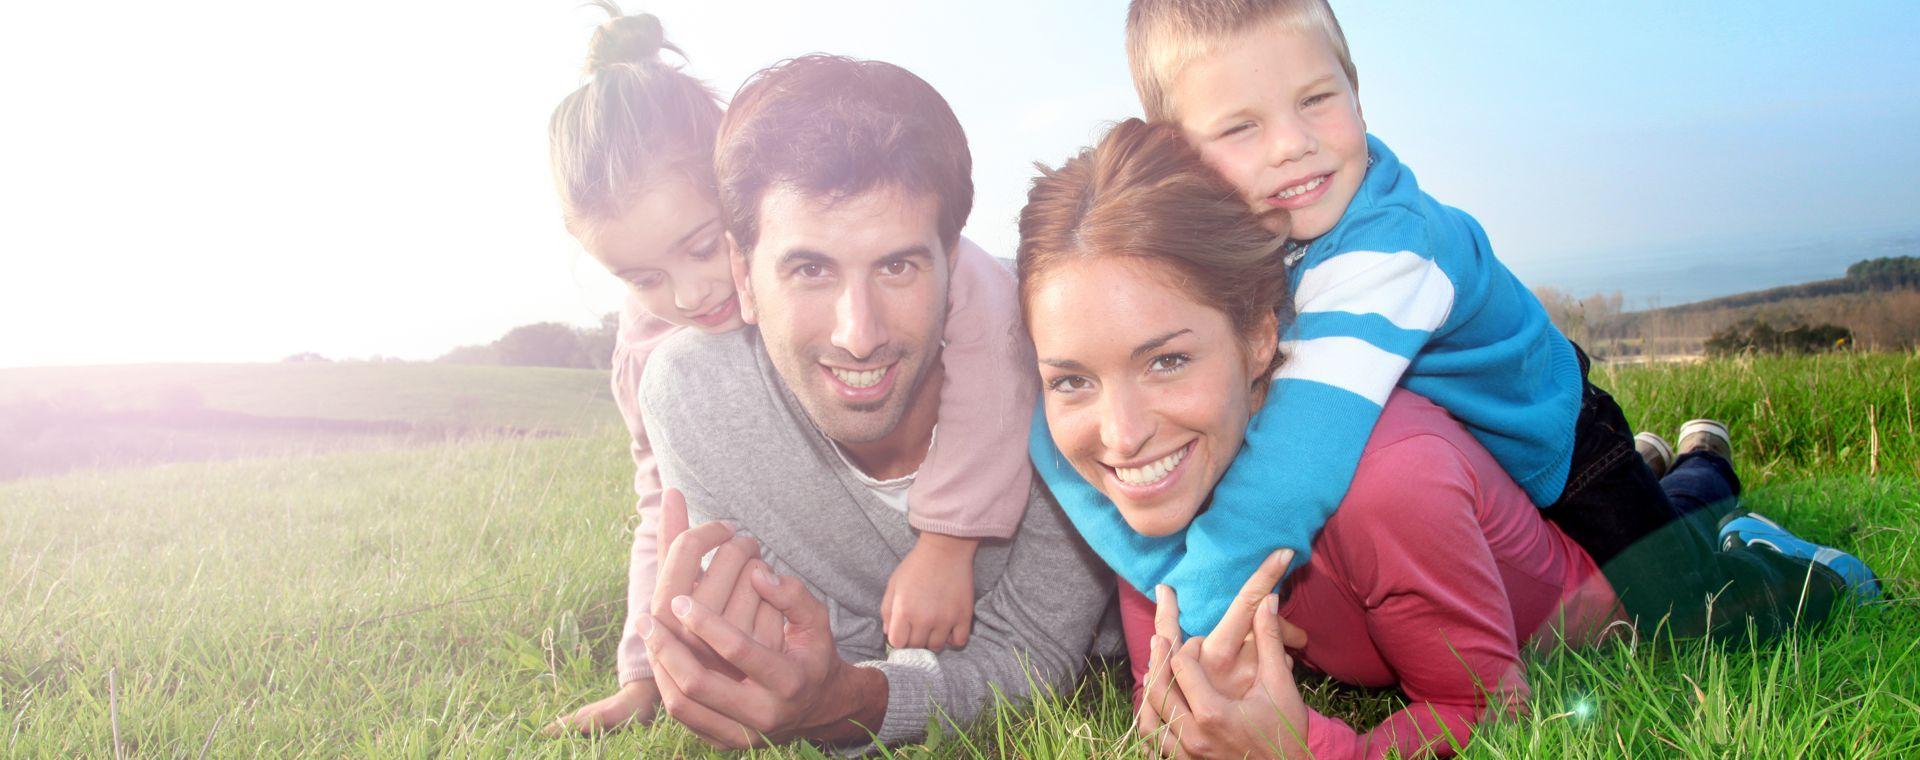 Rodinná dovolená - Chodsko, Klatovy, Domažlice, Staňkov